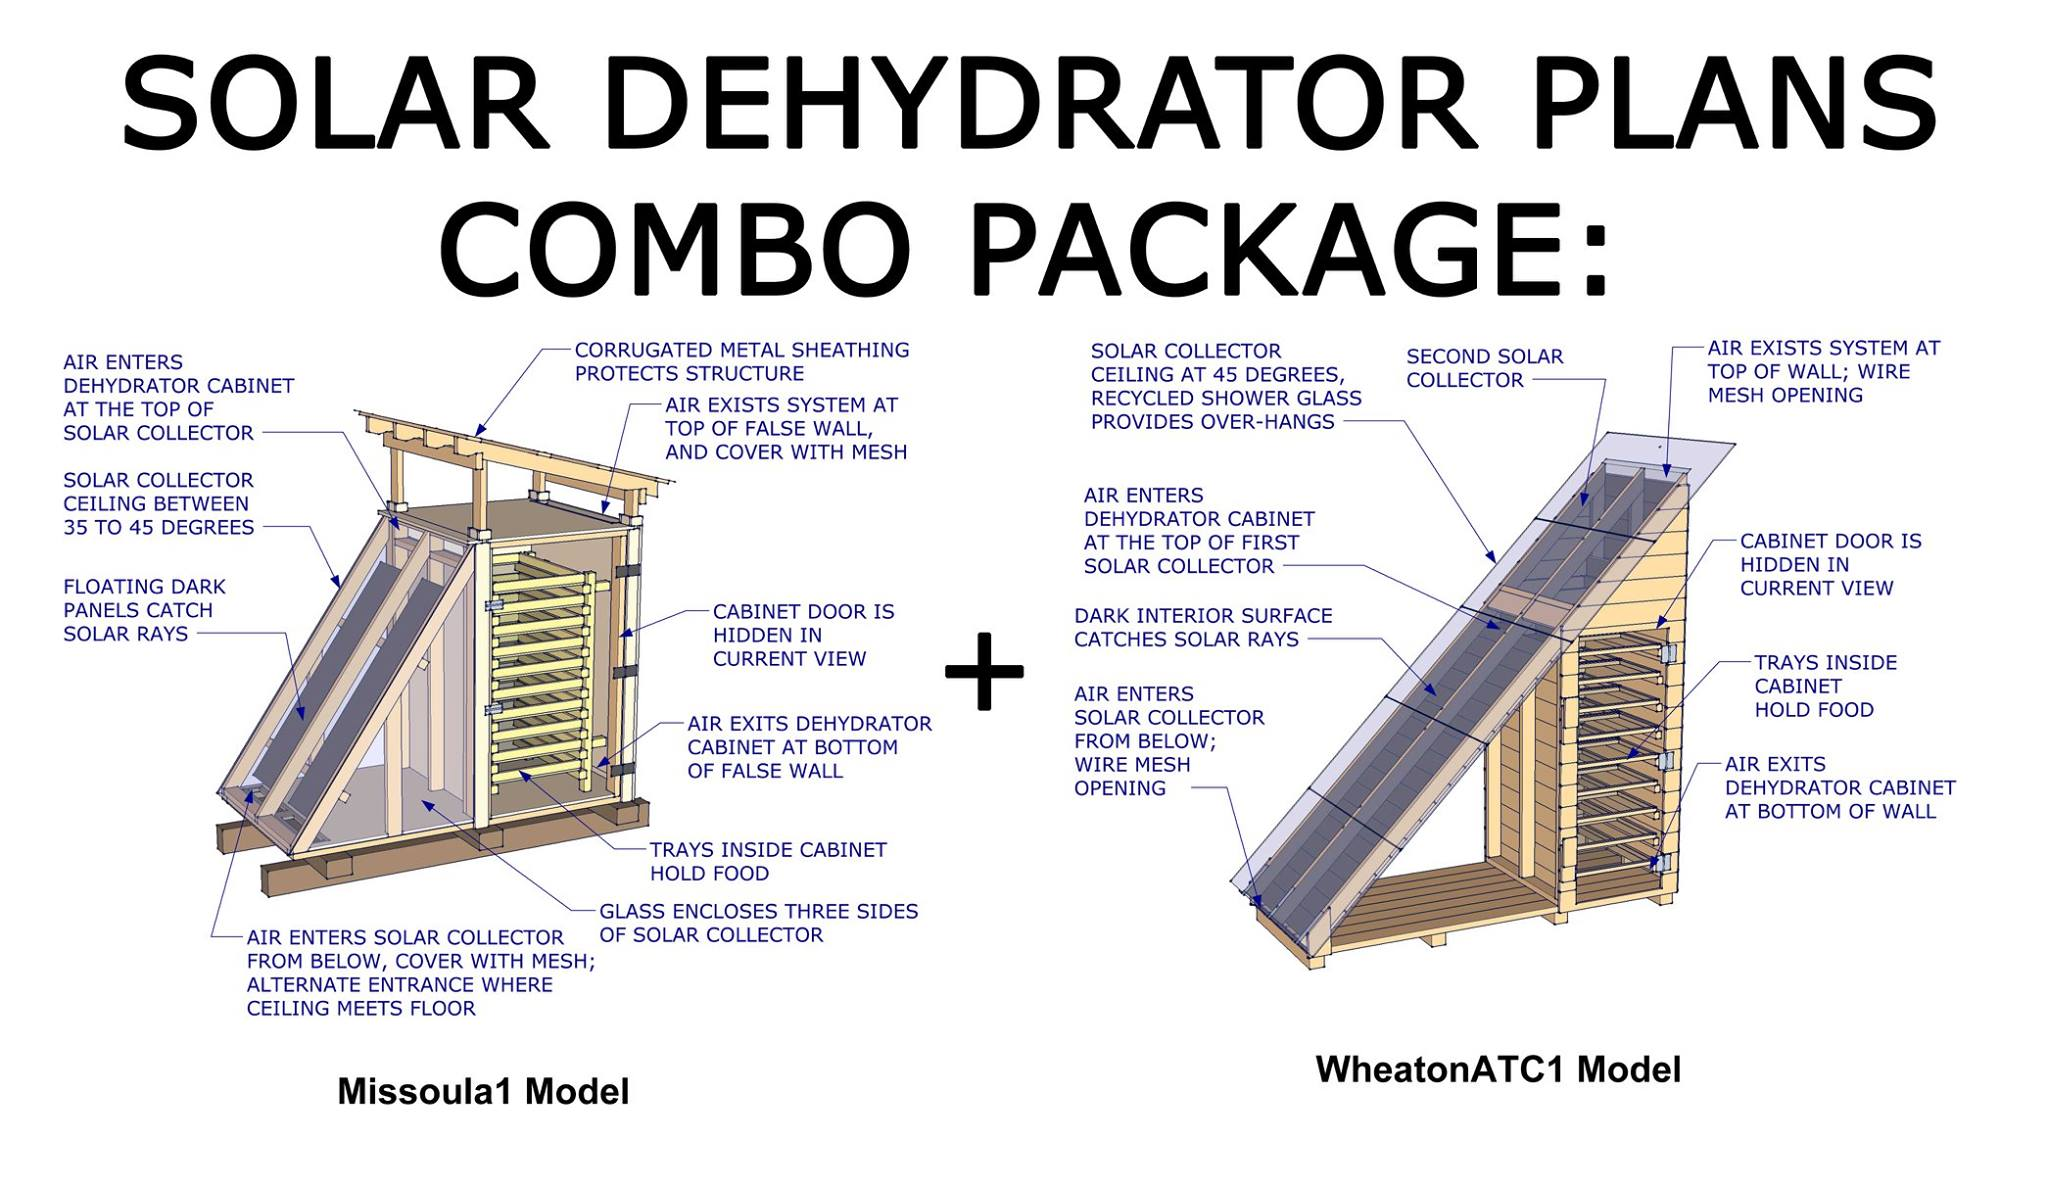 Solar Dehydrator Plans - Combo Package download (digital-market ...